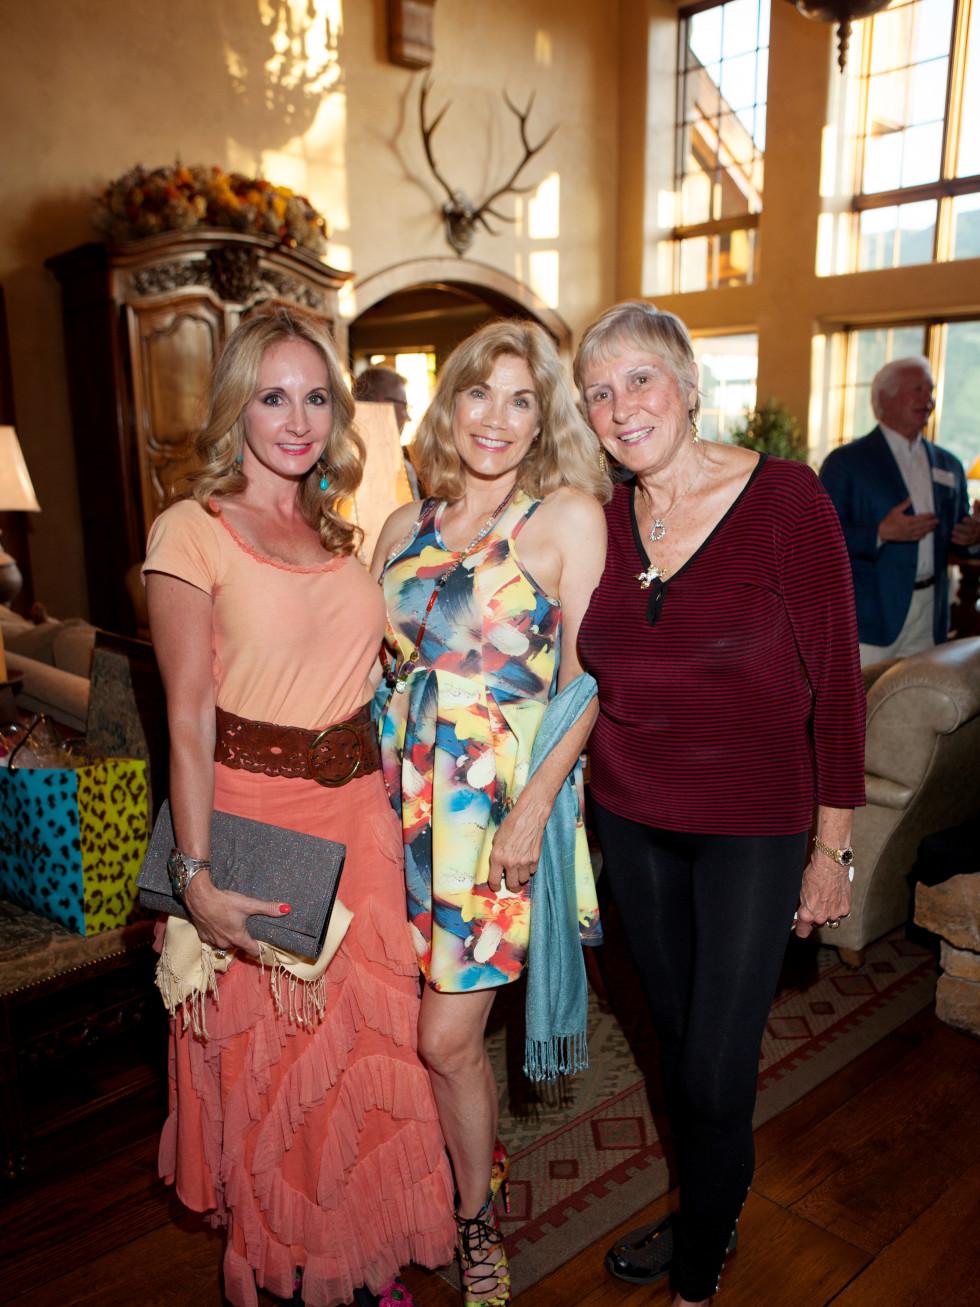 Houston, St. Luke's Foundation Summer Speaker Series Aspen, August 2015, Sharin Norman, Barbi Benton-Gradow, Helga Matuska